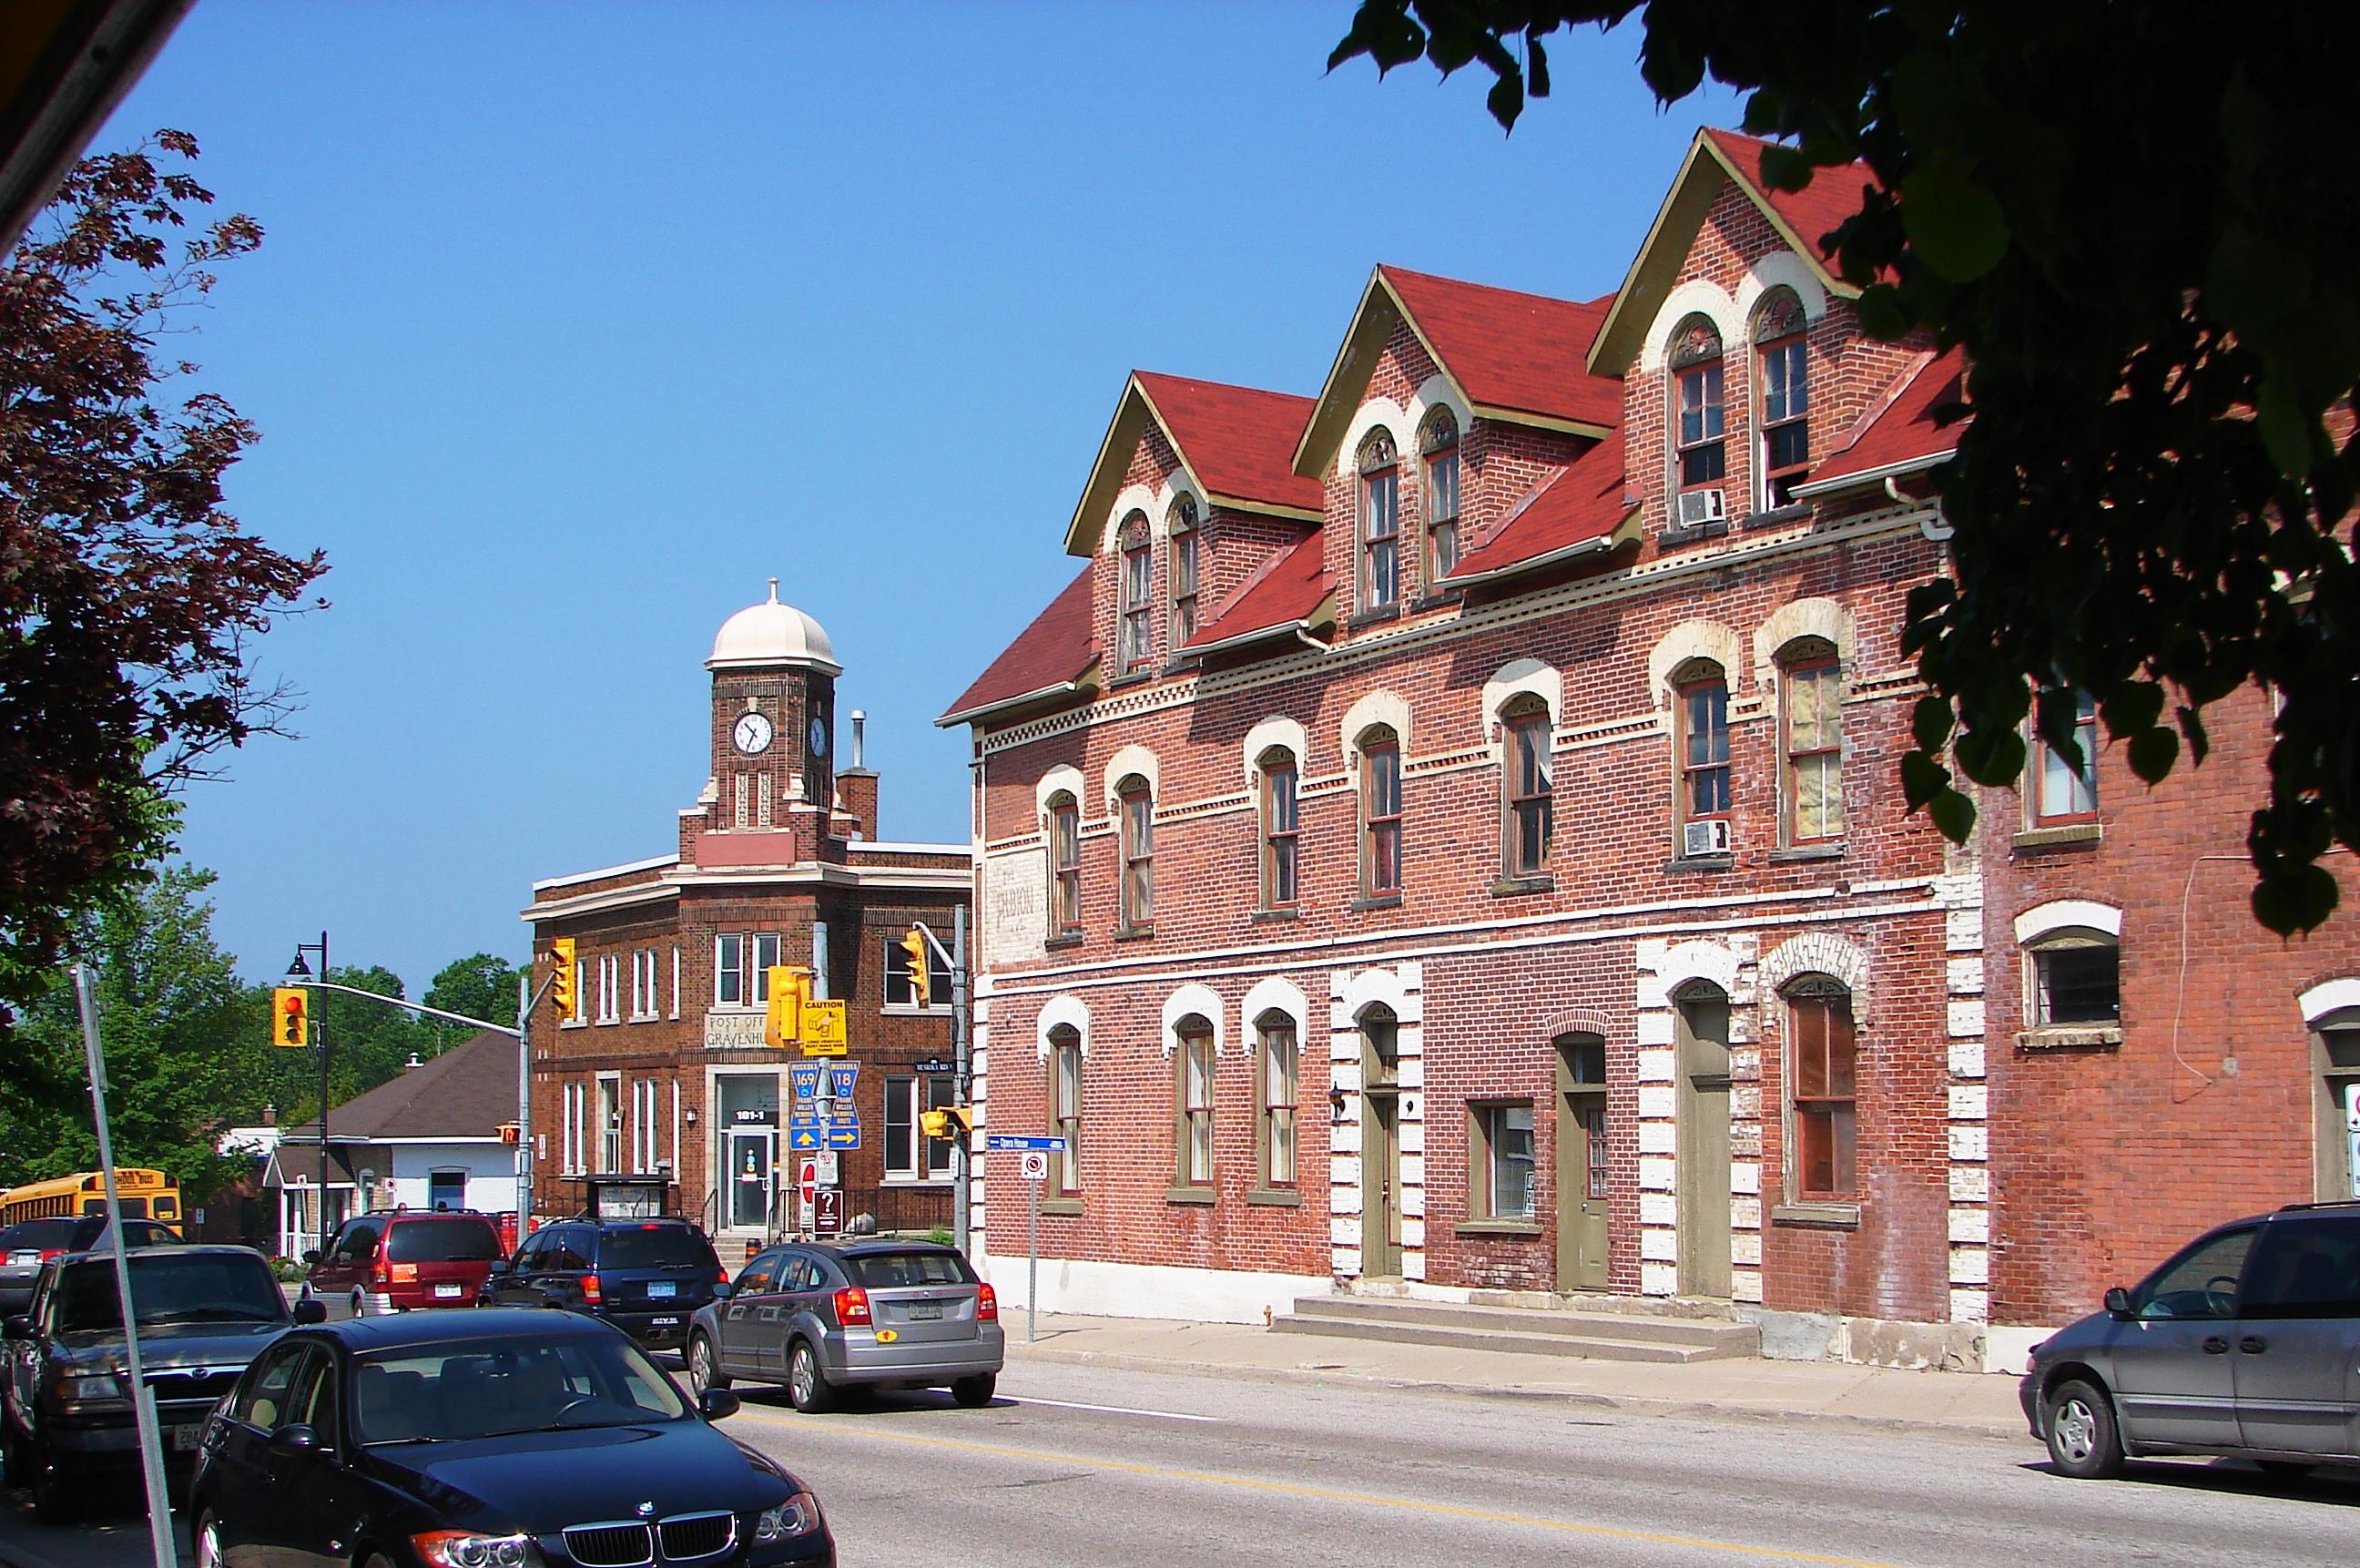 Gravenhurst Main street